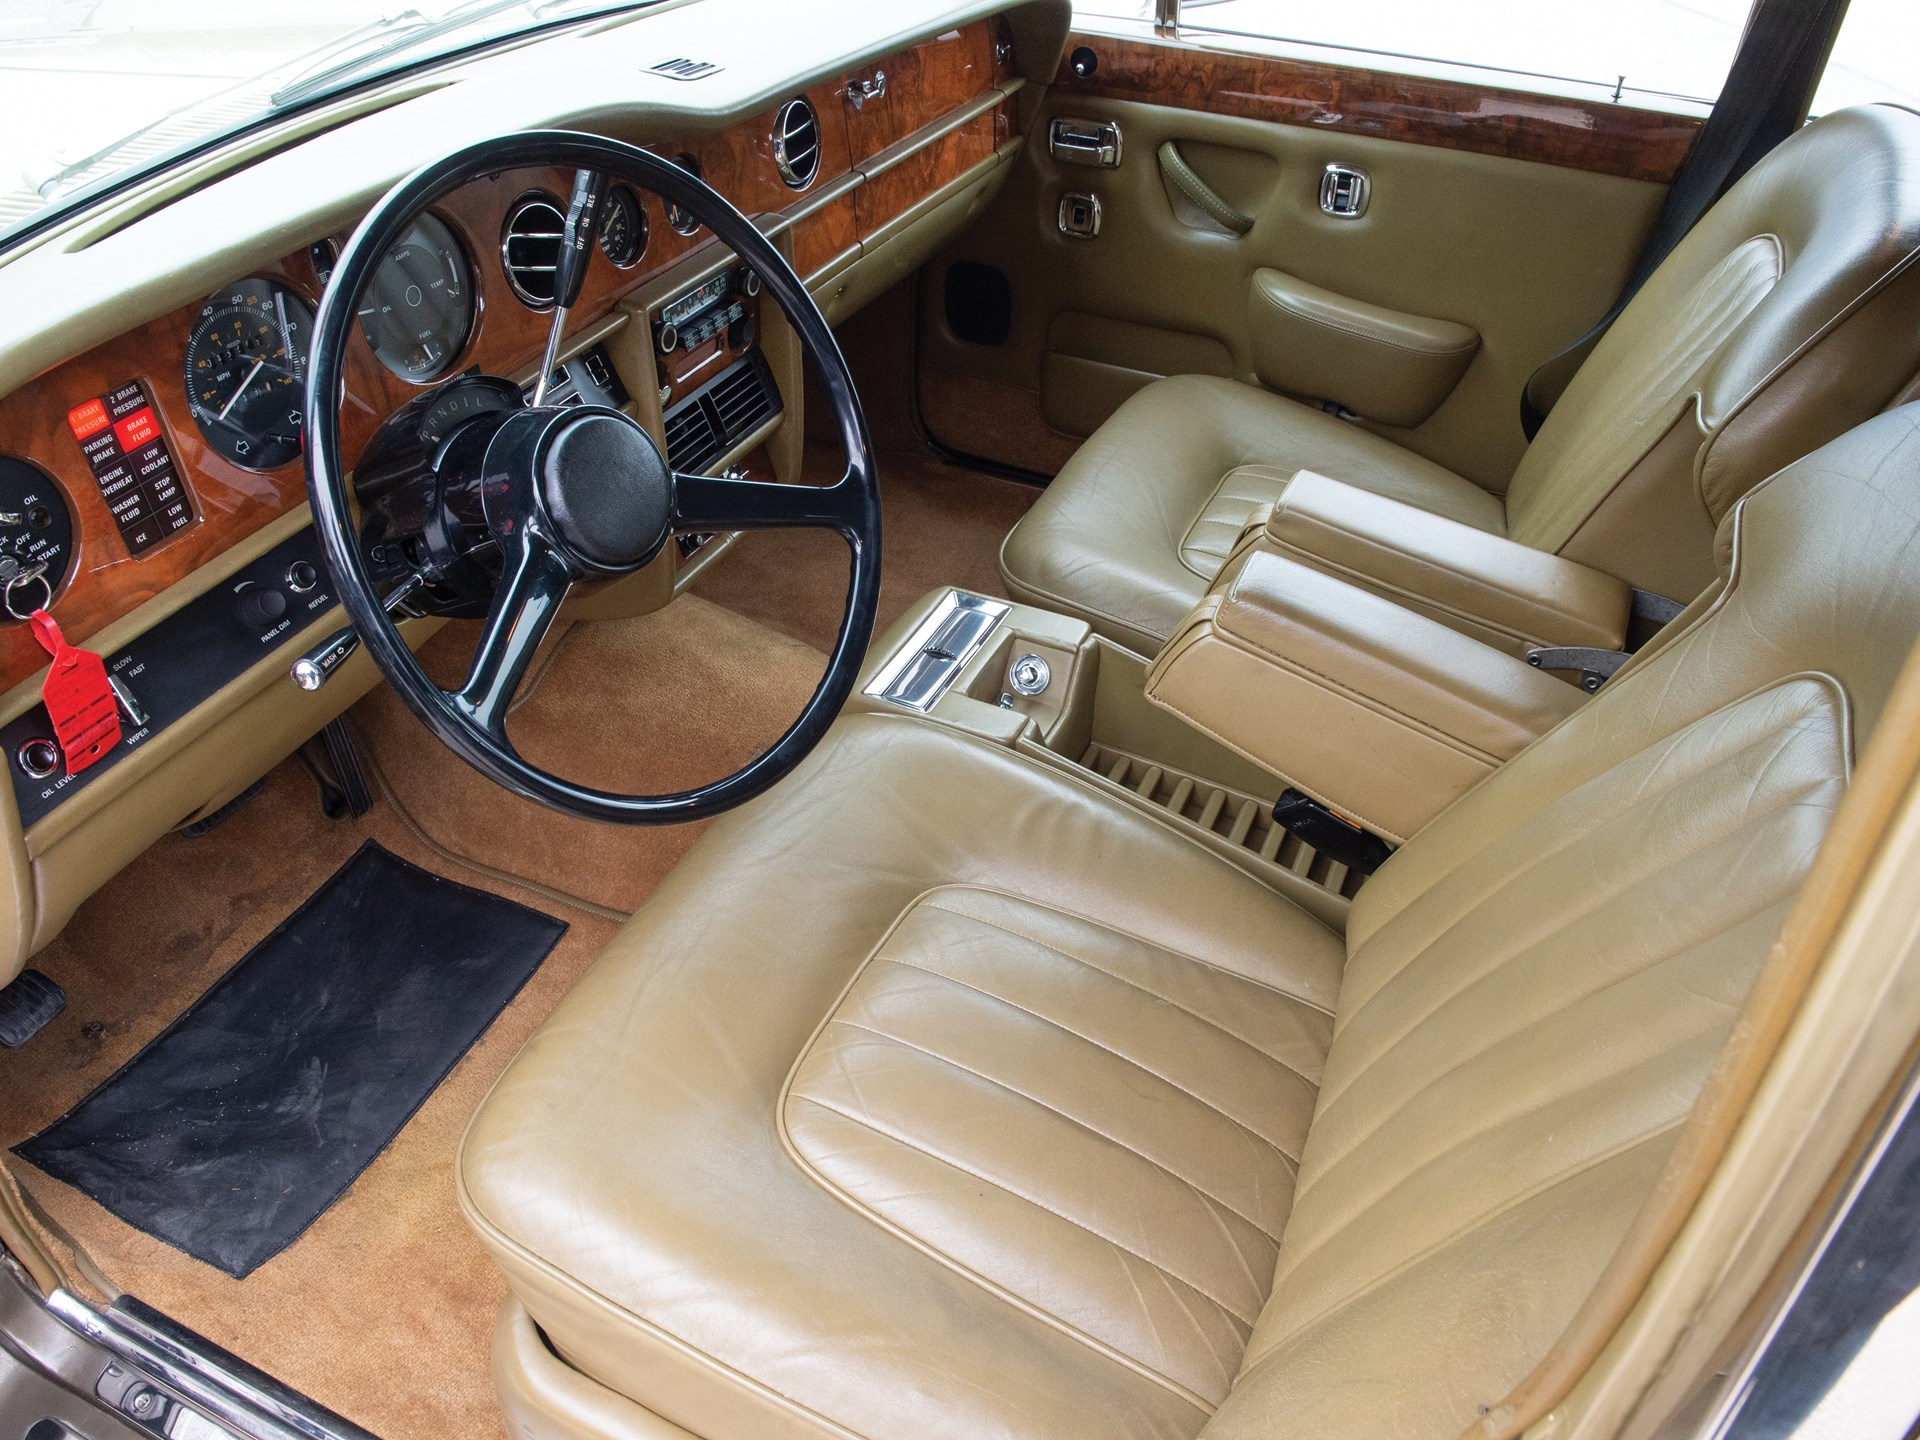 1979 Rolls-Royce Silver Shadow interior